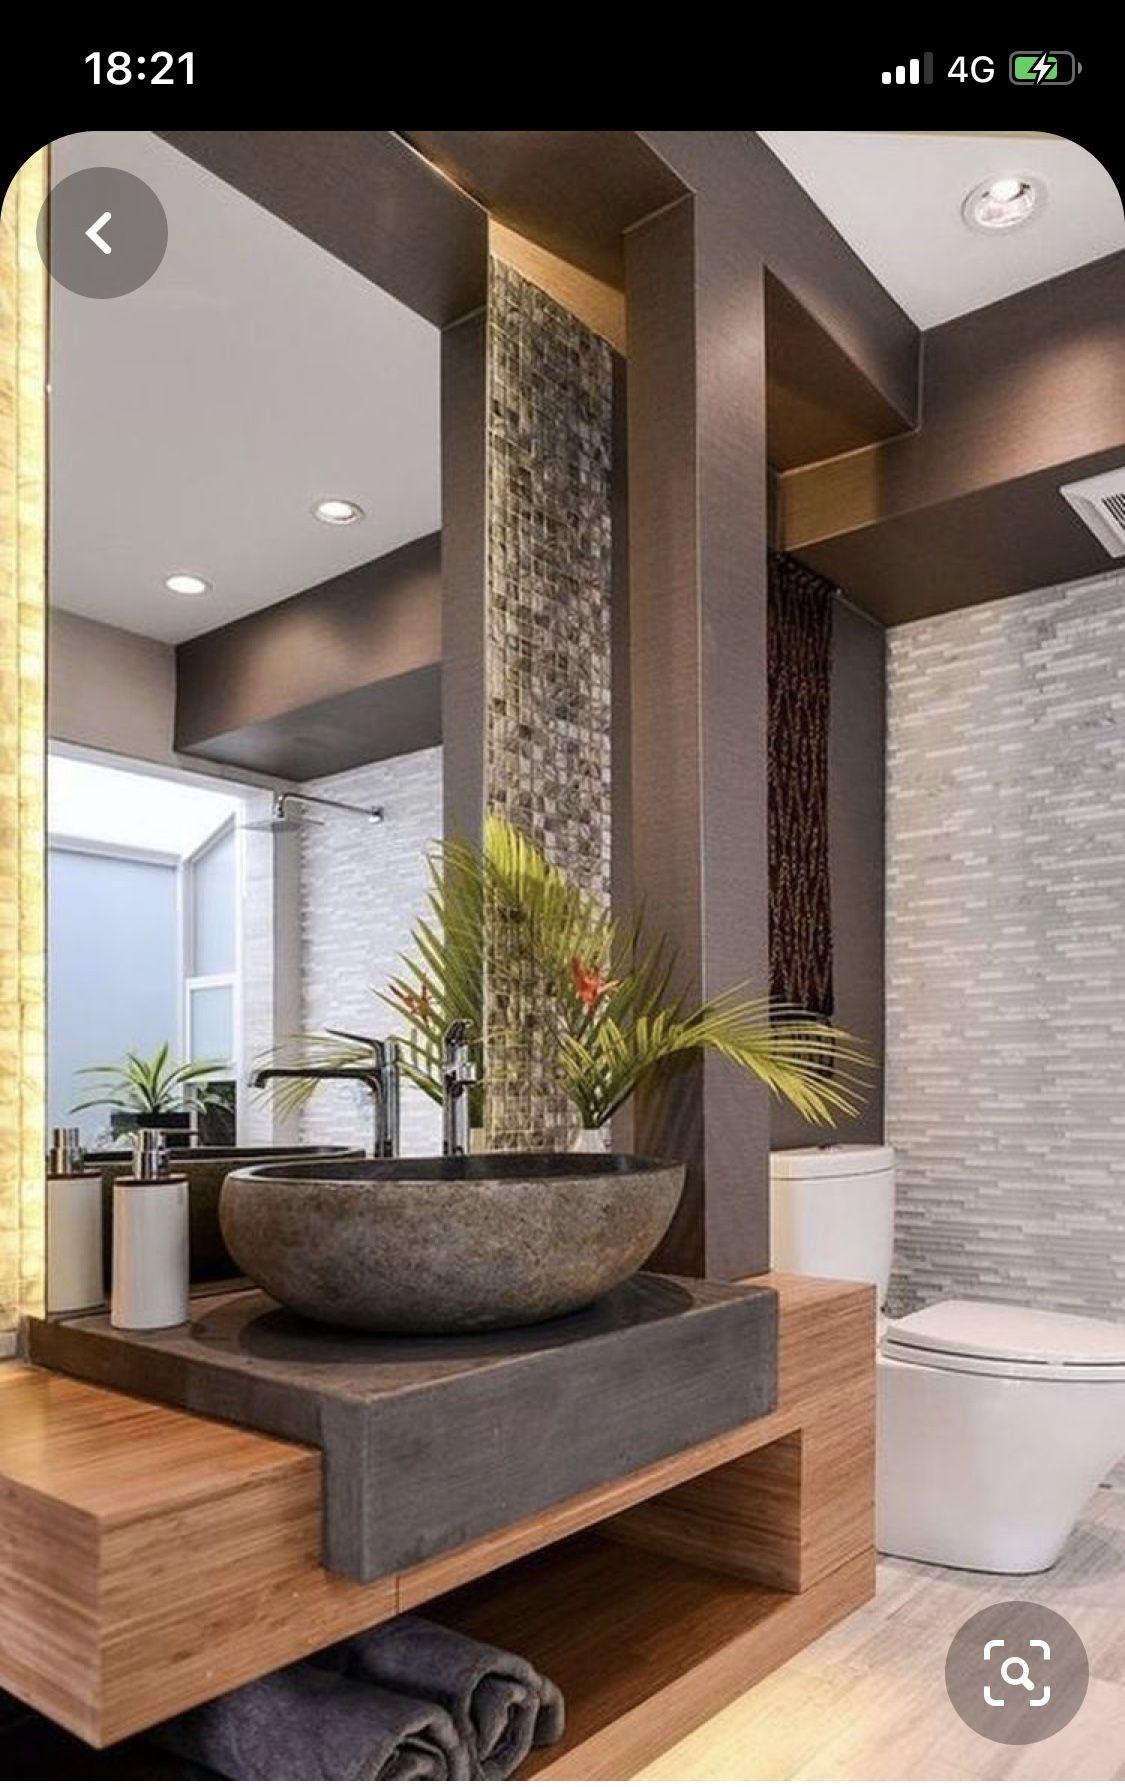 Pin By Marijana Mesic On Guest Bathroom Gorgeous Bathroom Designs Bathroom Design Decor Bathroom Interior Design Tiny home interior guest bathroom